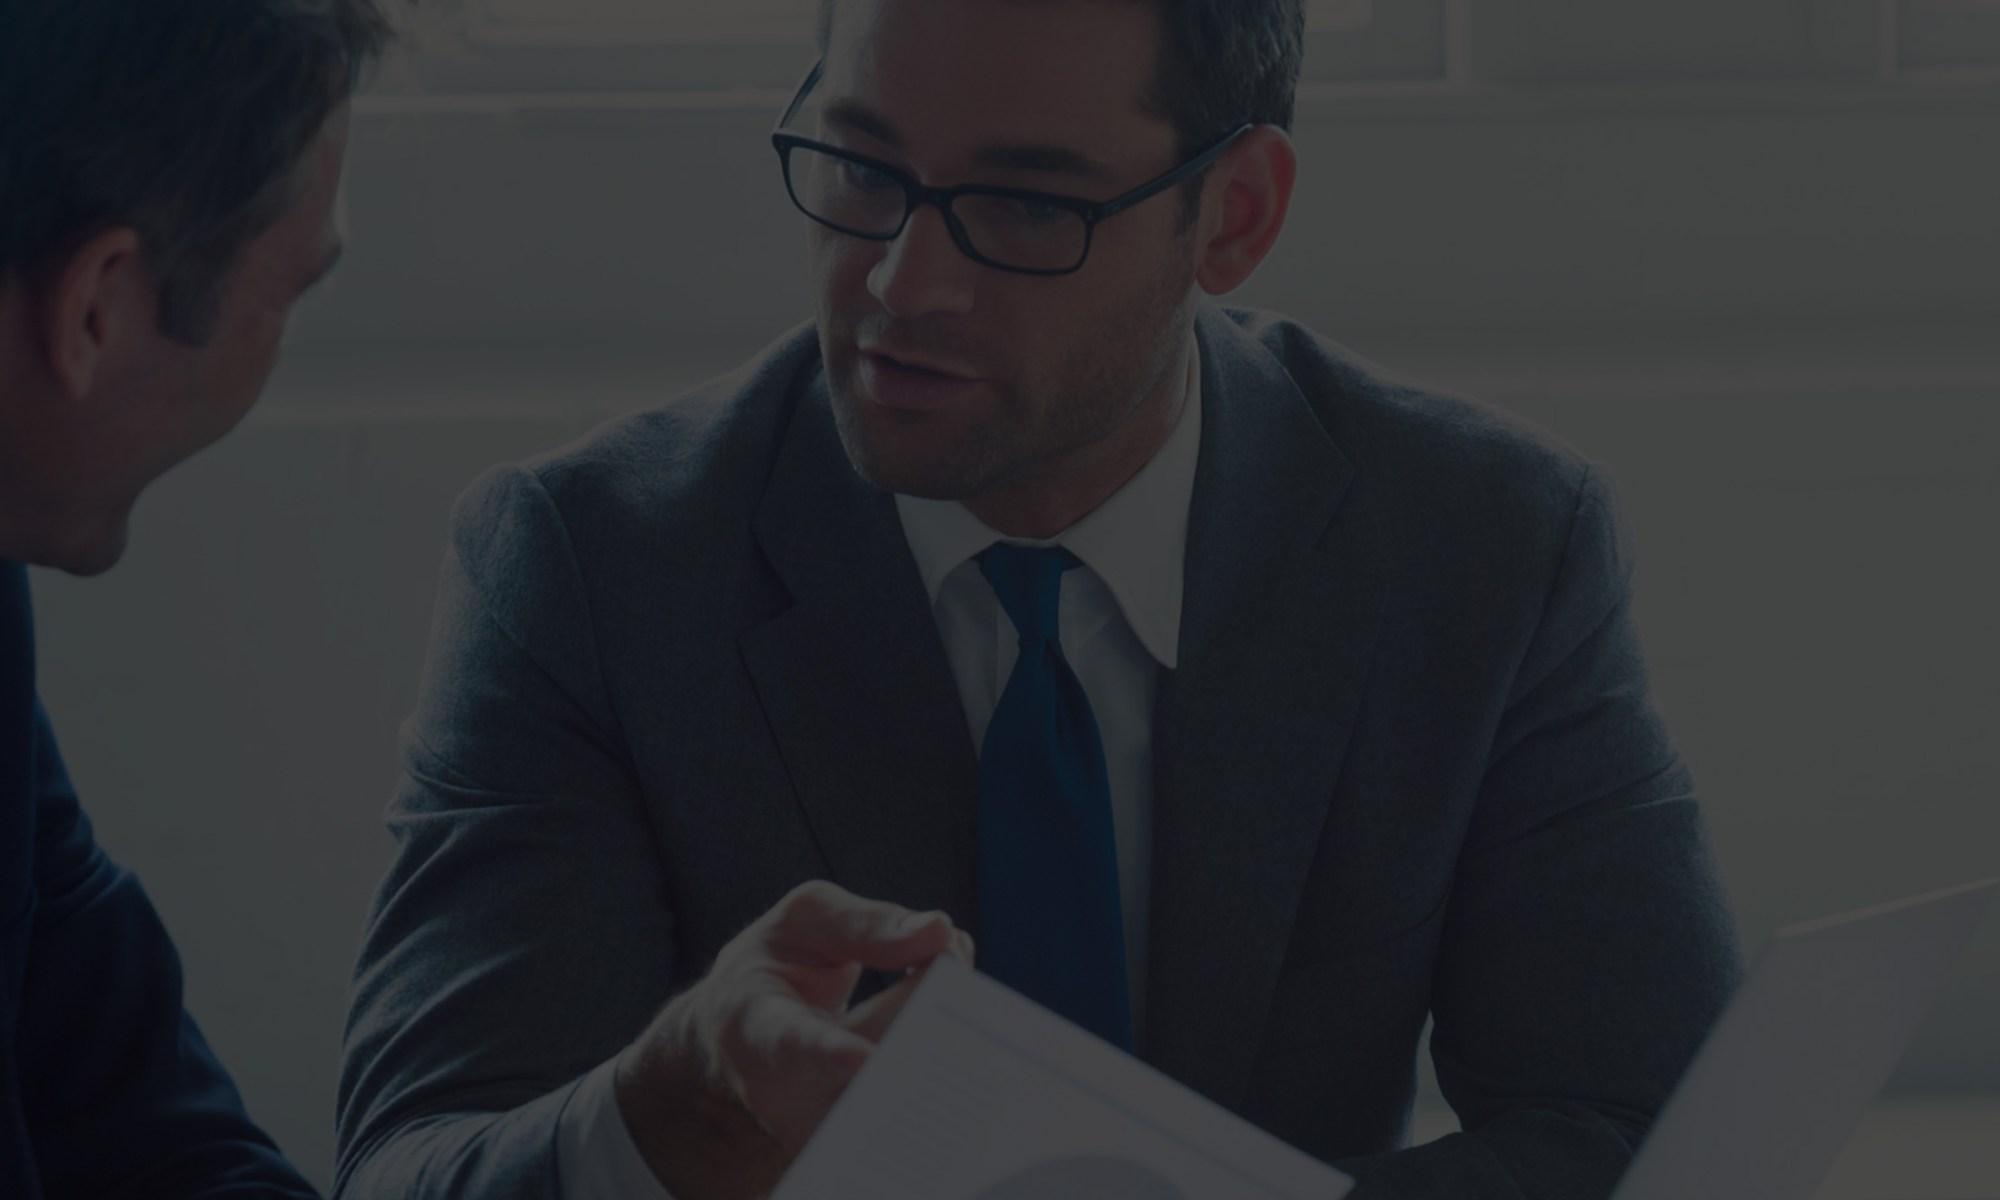 CMO Consulting Services - 1marketingidea